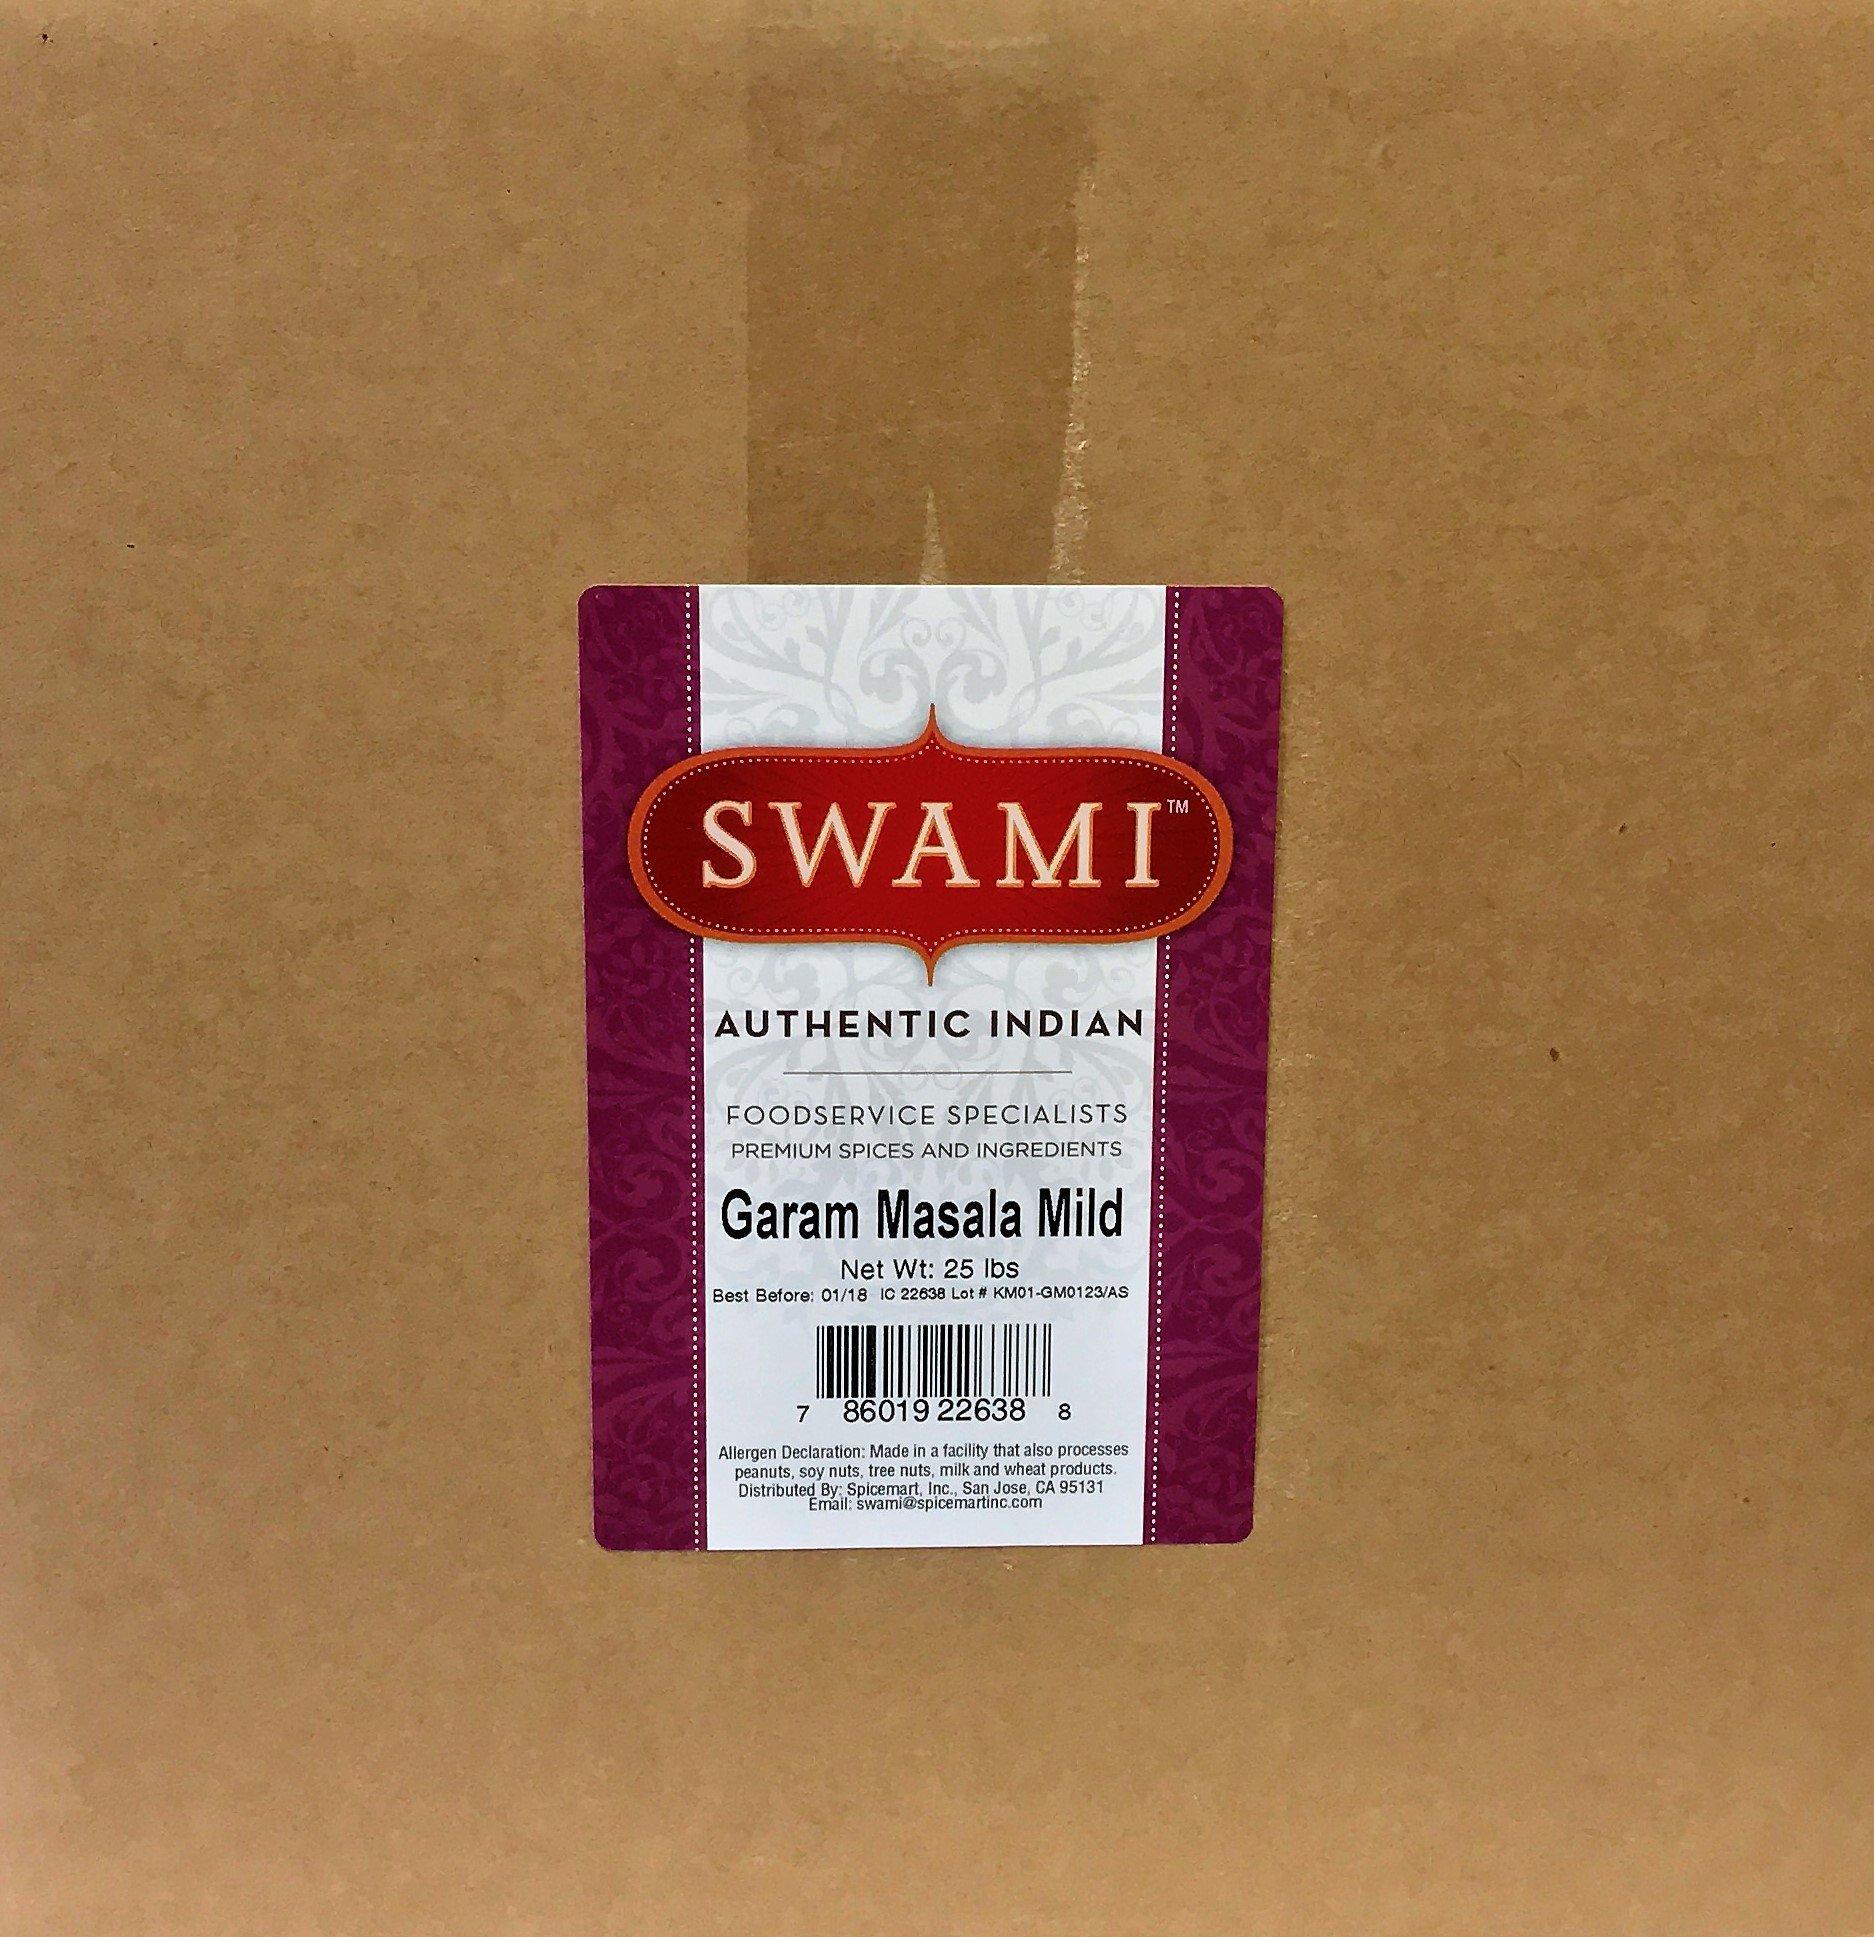 Swami Garam Masala(Mild) 25lb by Spicemart